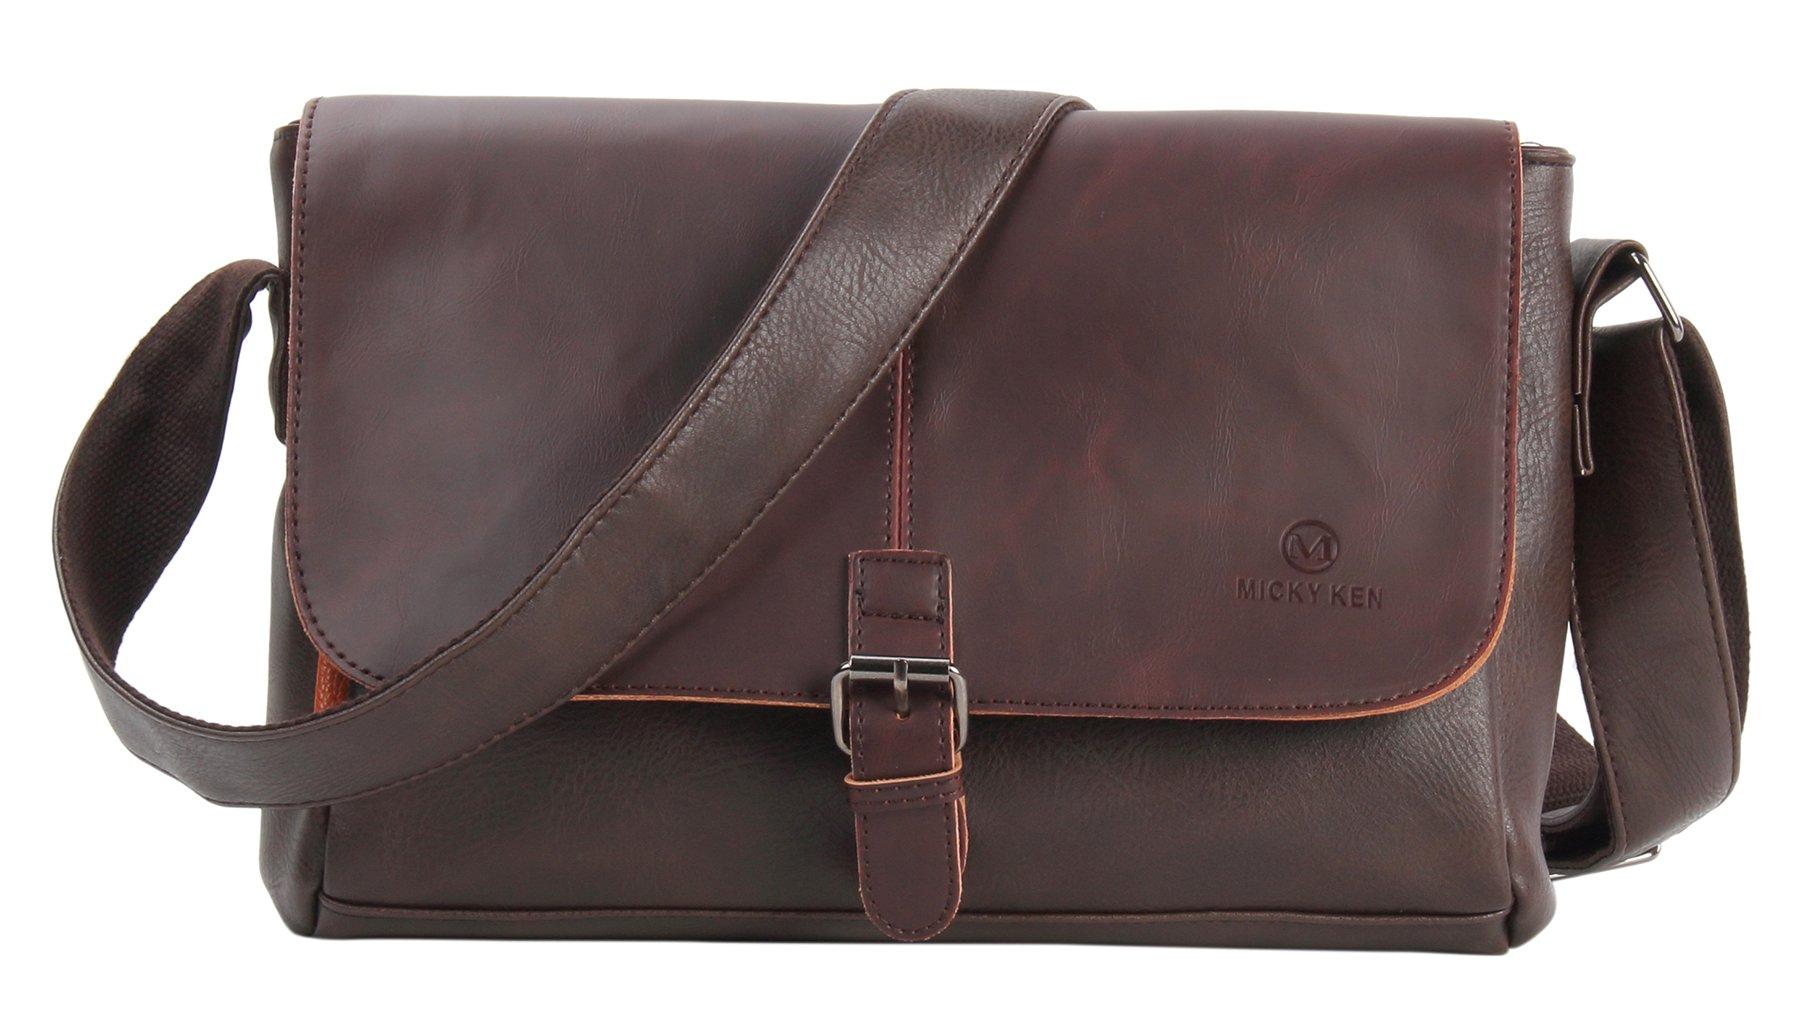 HONEYJOY Men's Vintage PU Leather Messenger Bag Satchel Shoulder Laptop Bags Business Working Bag Coffee